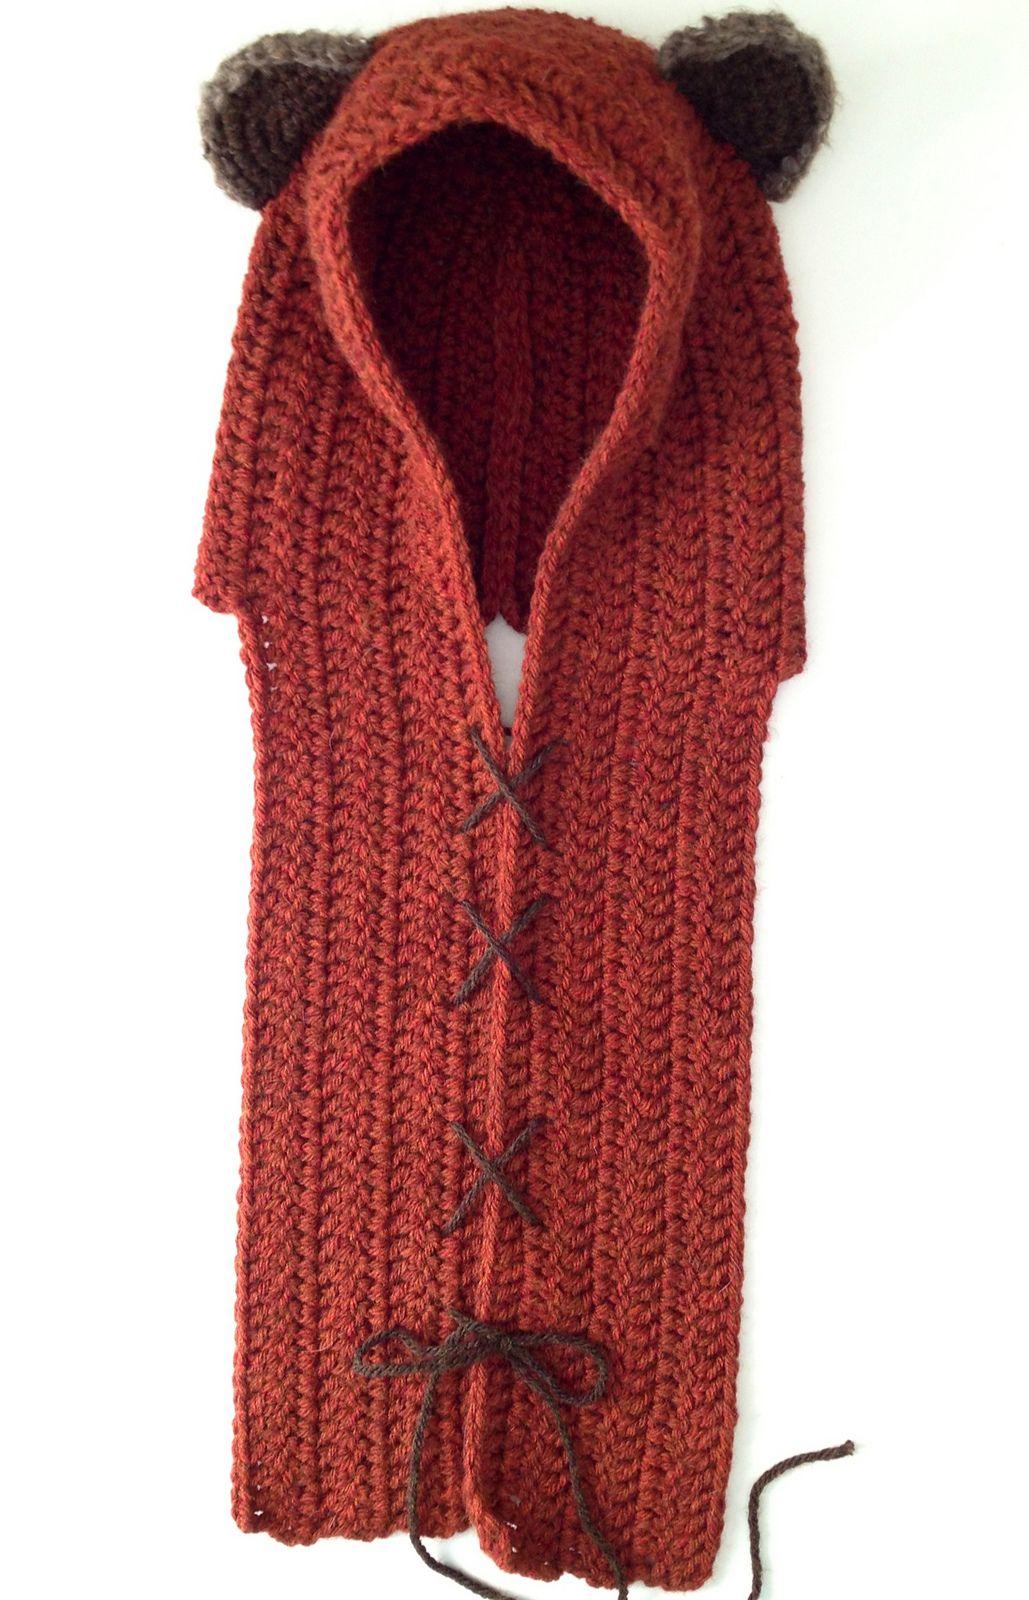 Yub Nub (Ewok) Scoodie By Kristen Stevenson - Free Crochet Pattern ...